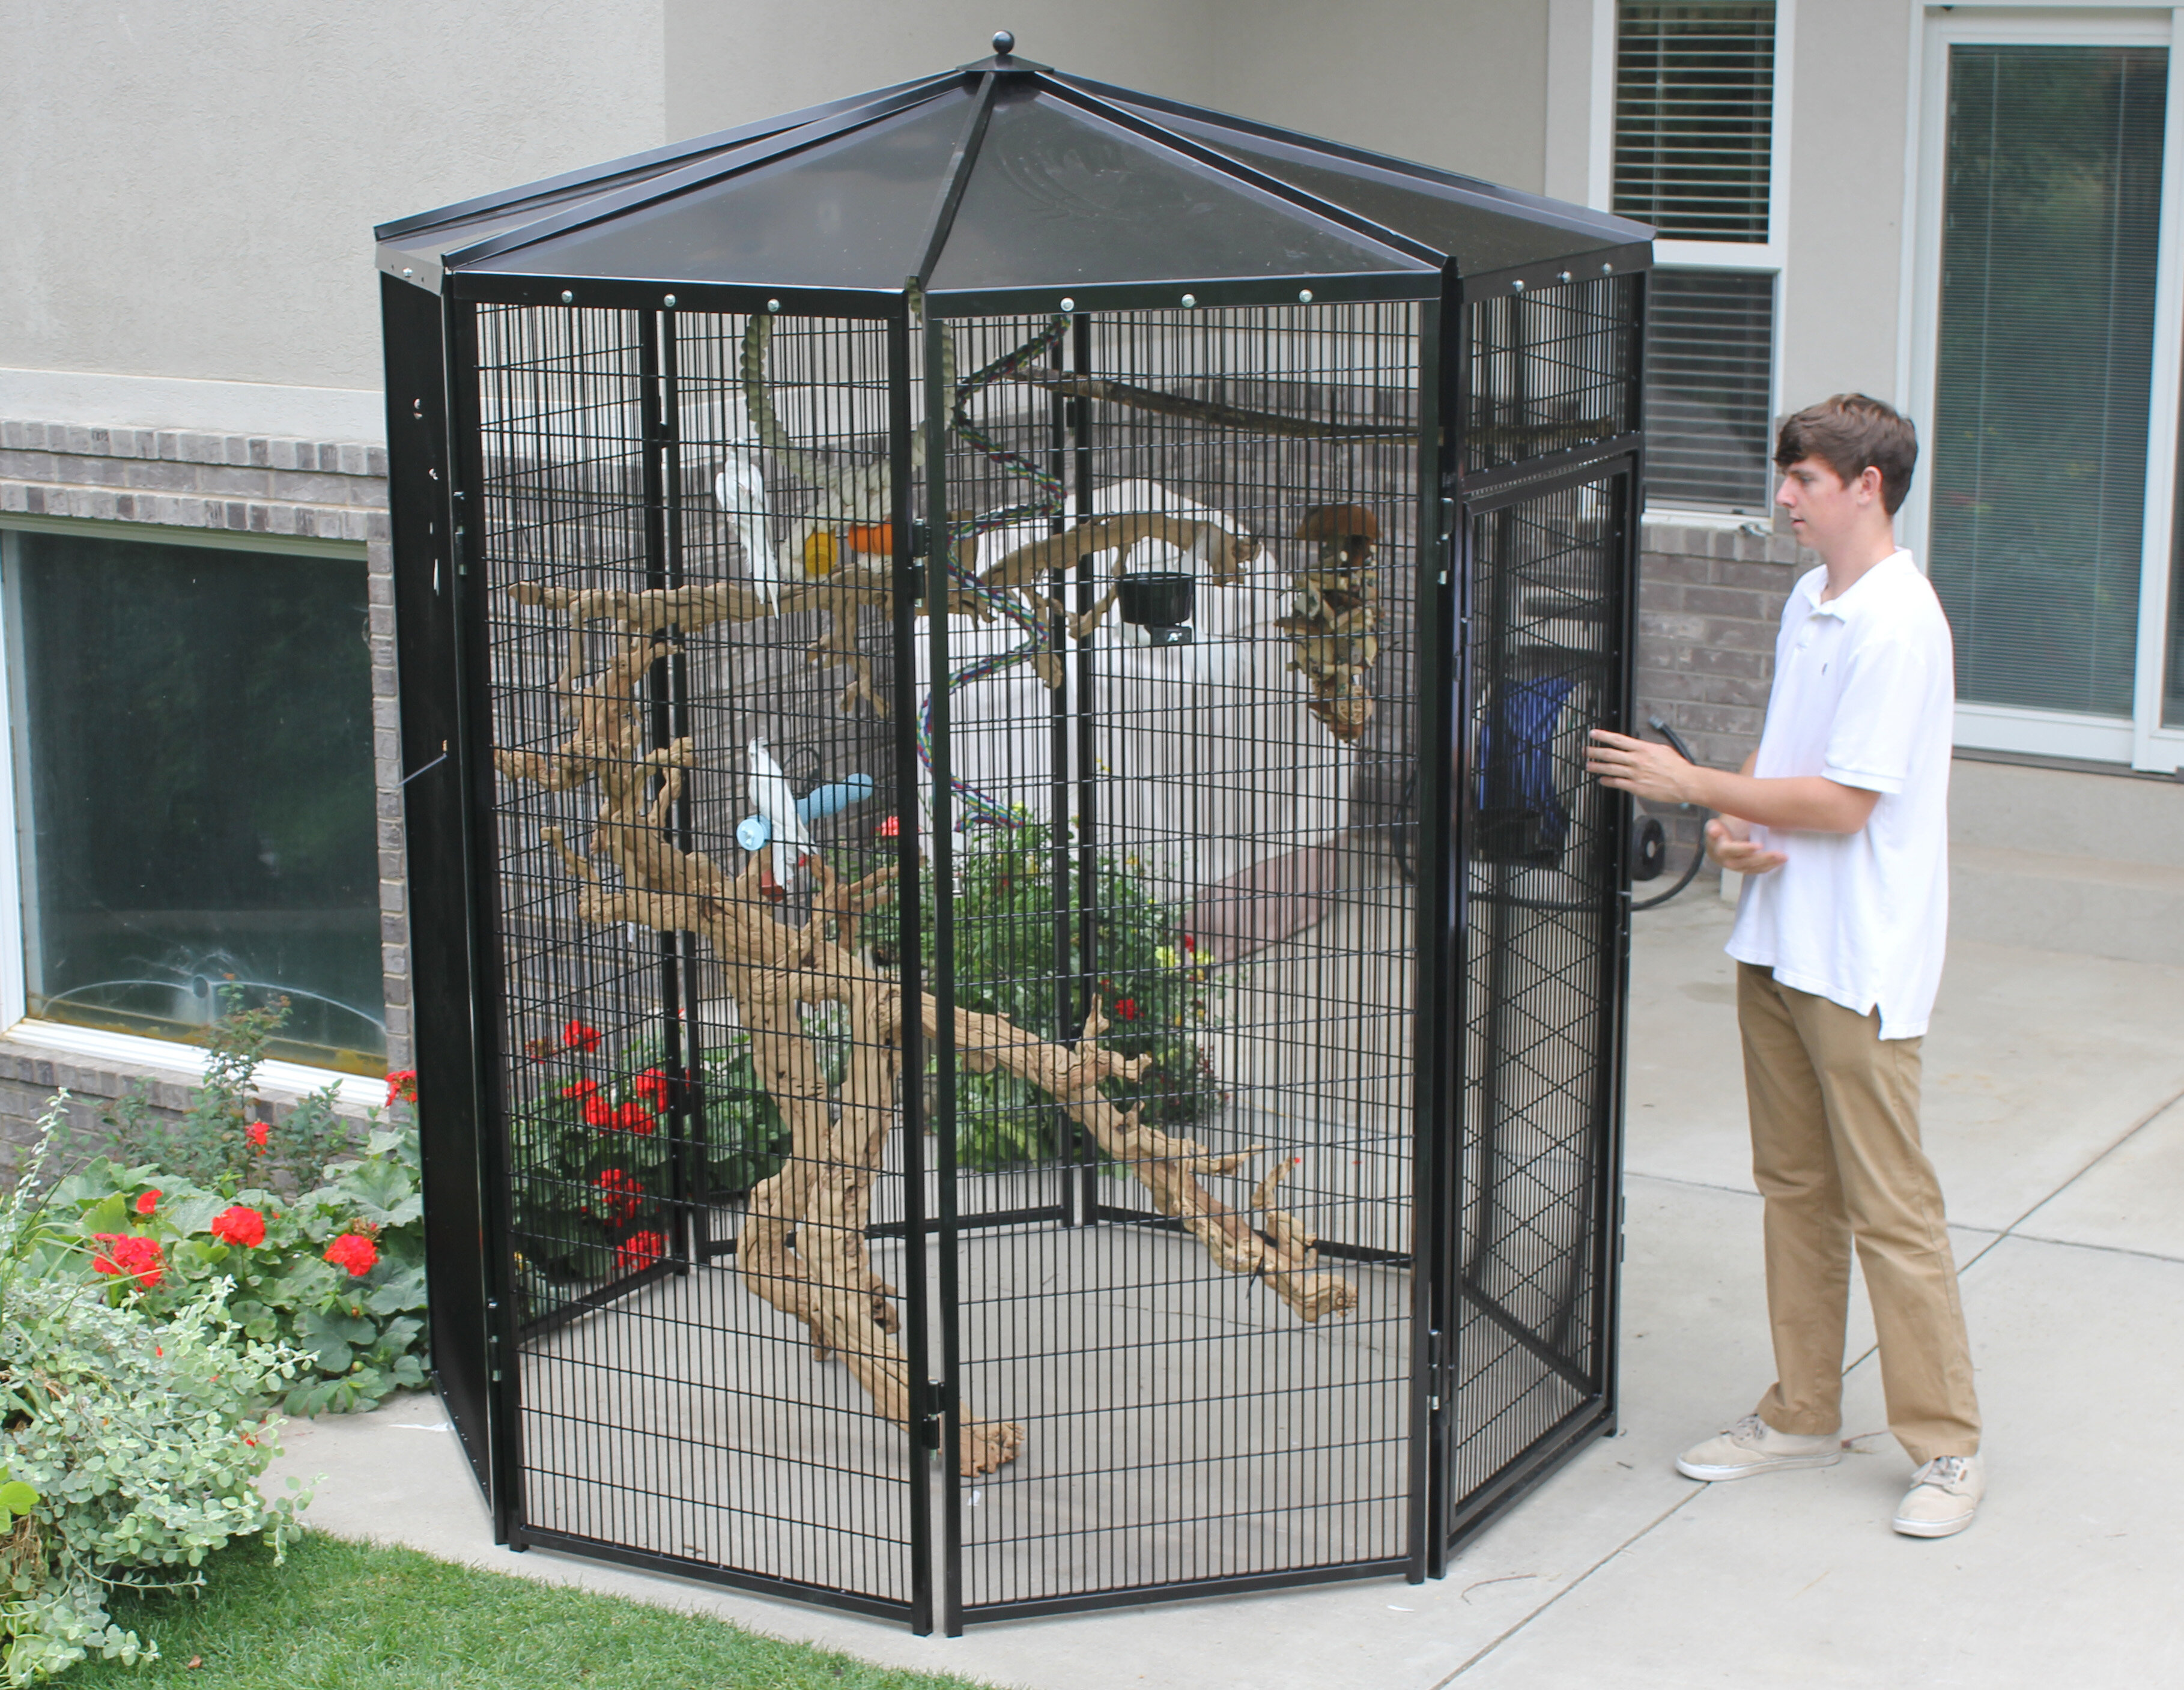 K9 Kennel 8 Sided Bird Aviary | Wayfair